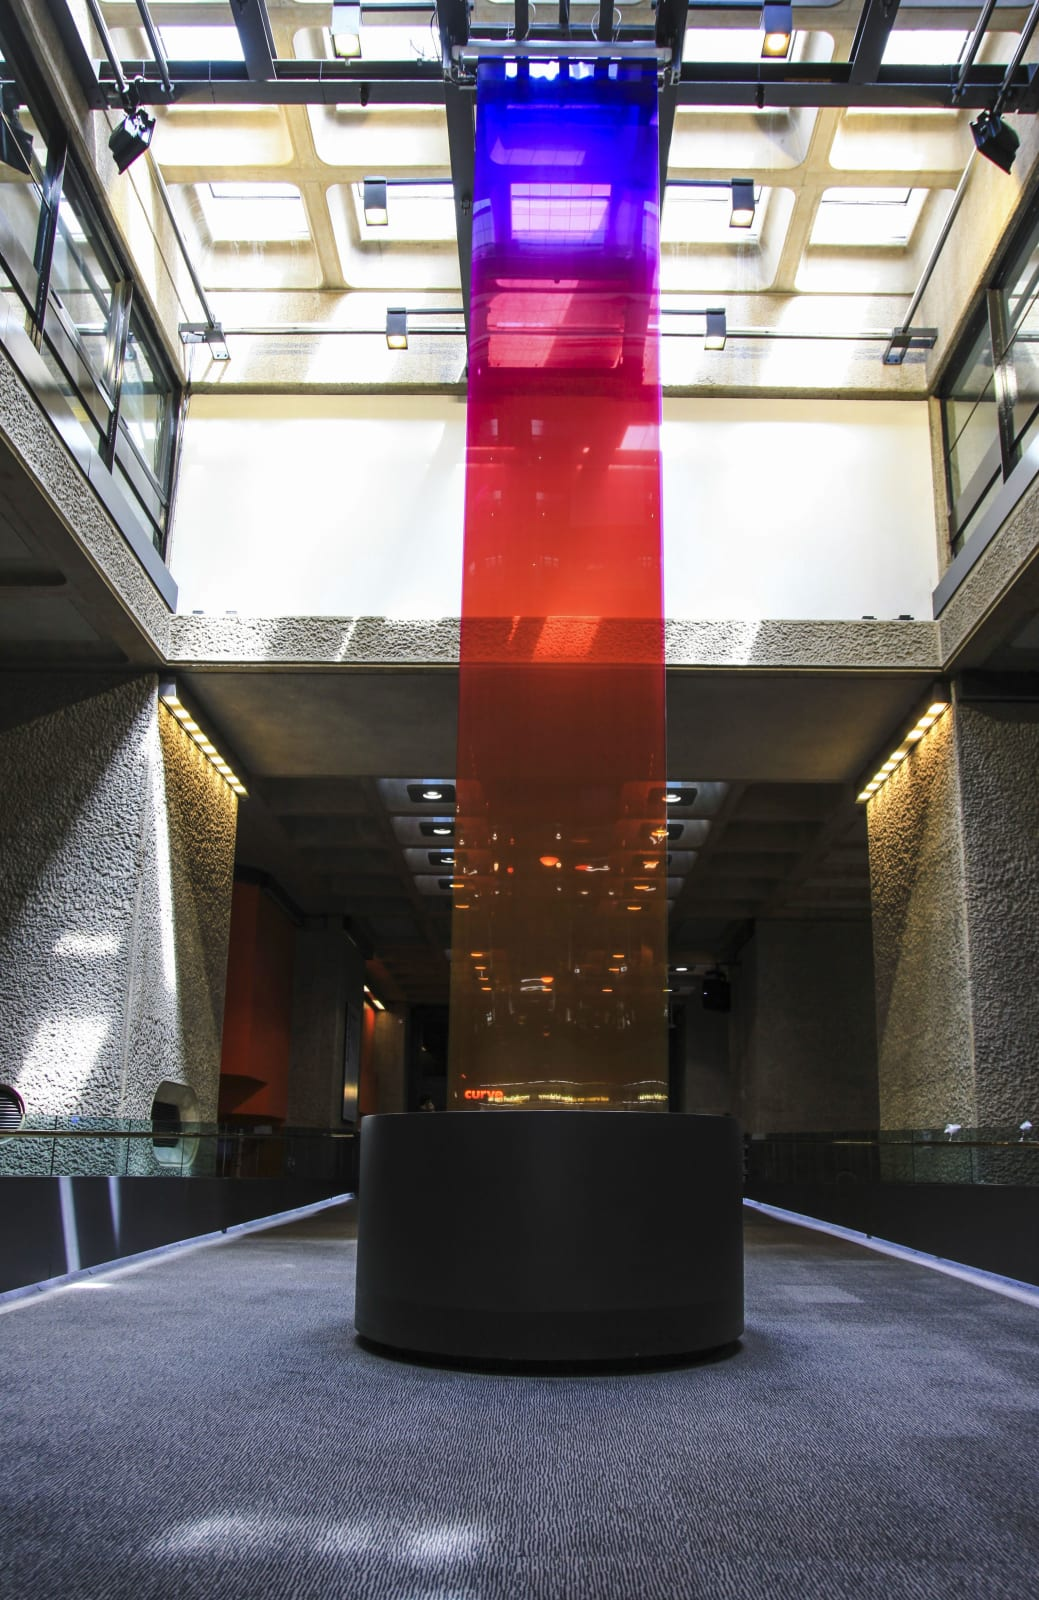 Installation View Borrowed Light (2018), Barbican Center, London (2018-2019) | Photo: Studio Troika